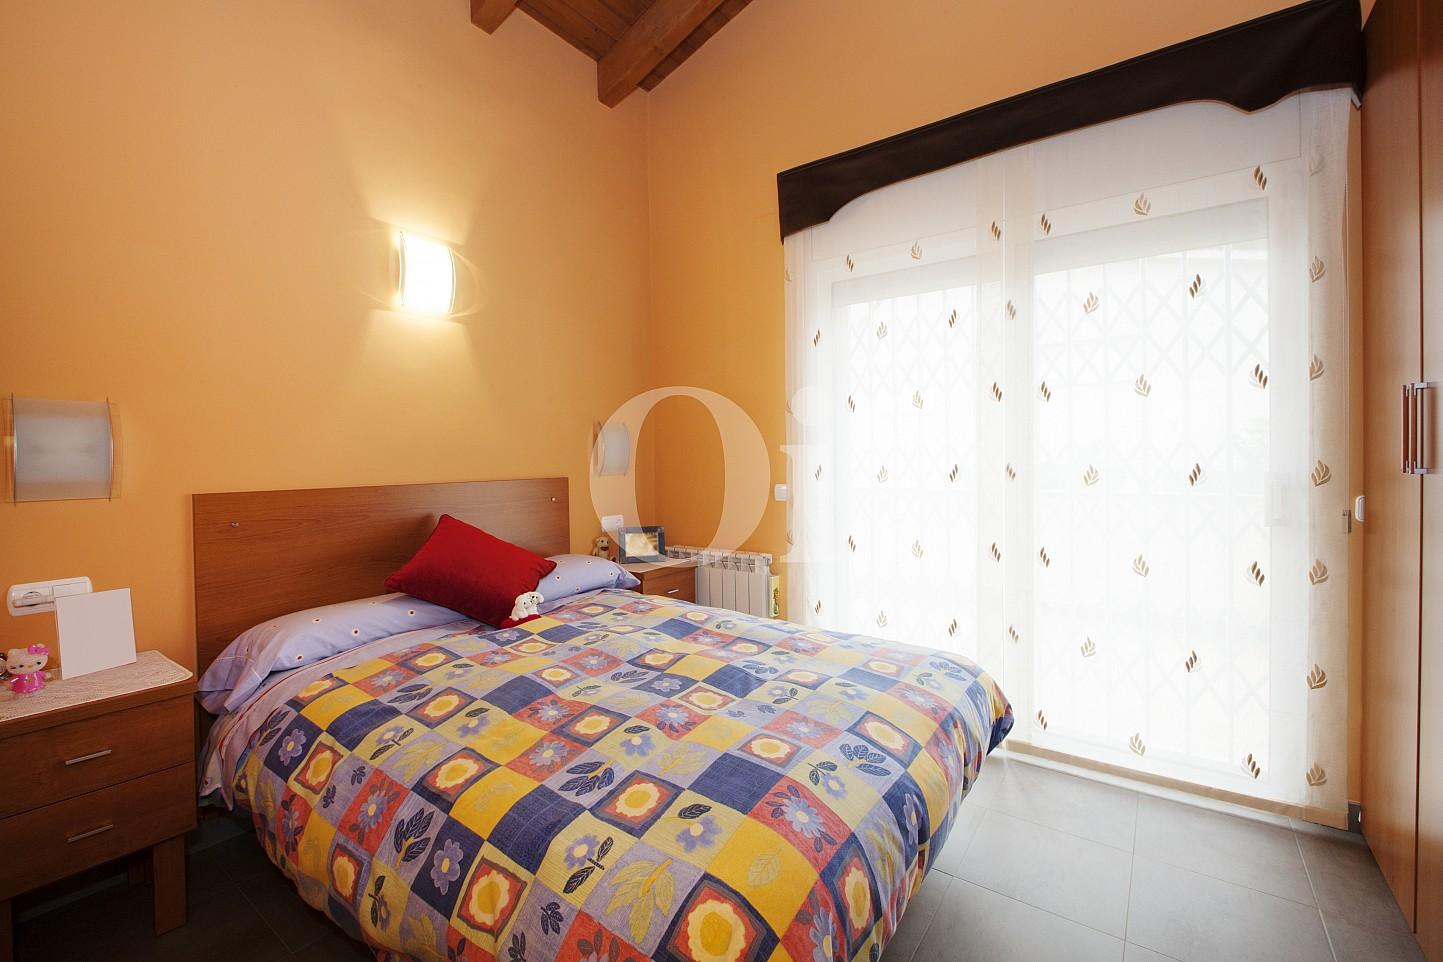 Cuarto de casa en venta en Segur de Calafell, Baix Penedès, Tarragona